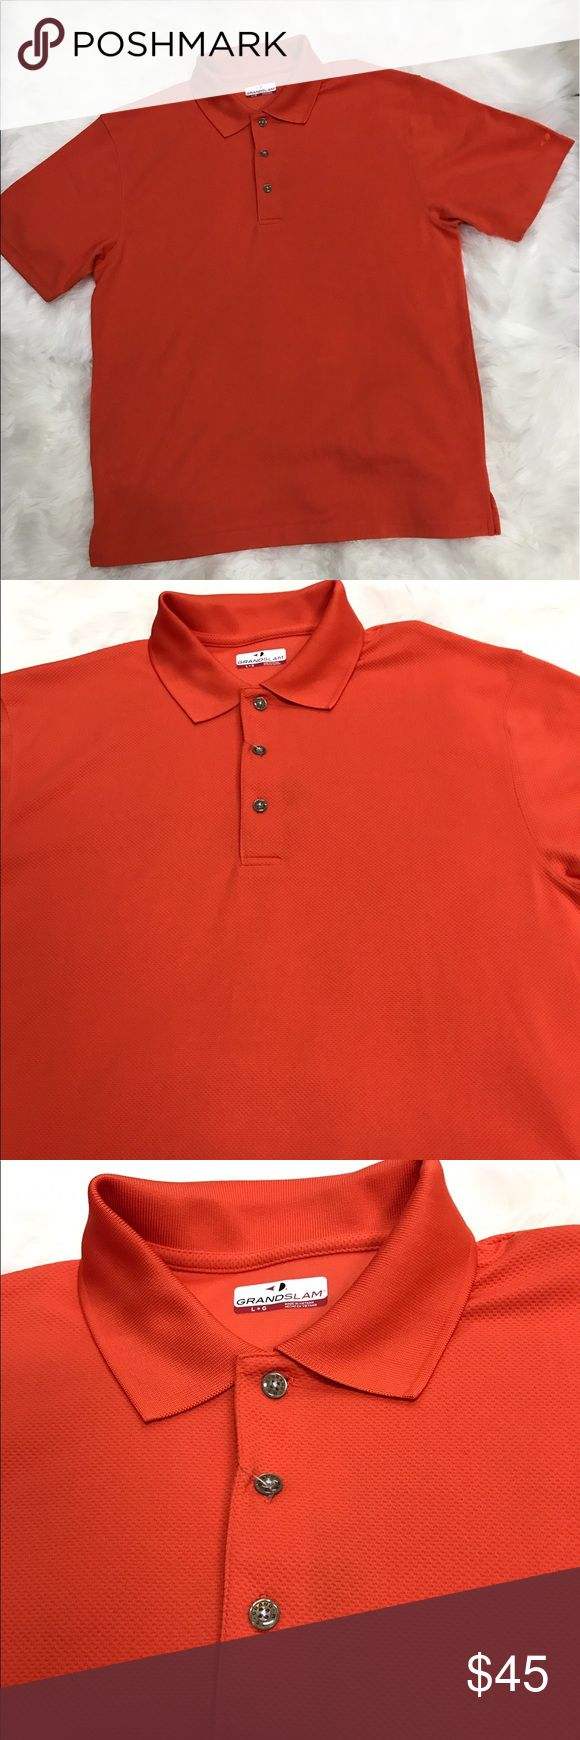 "Grand Slams Men's Golf Polo Shirt DriFlow. Easy care. SunFlow UPF 50. Short sleeve, pull over size large golf shirt. 28"" length, 22 1/2"" armpit to armpit, 20 1/2"" shoulder to shoulder. Grand Slams Shirts Polos"